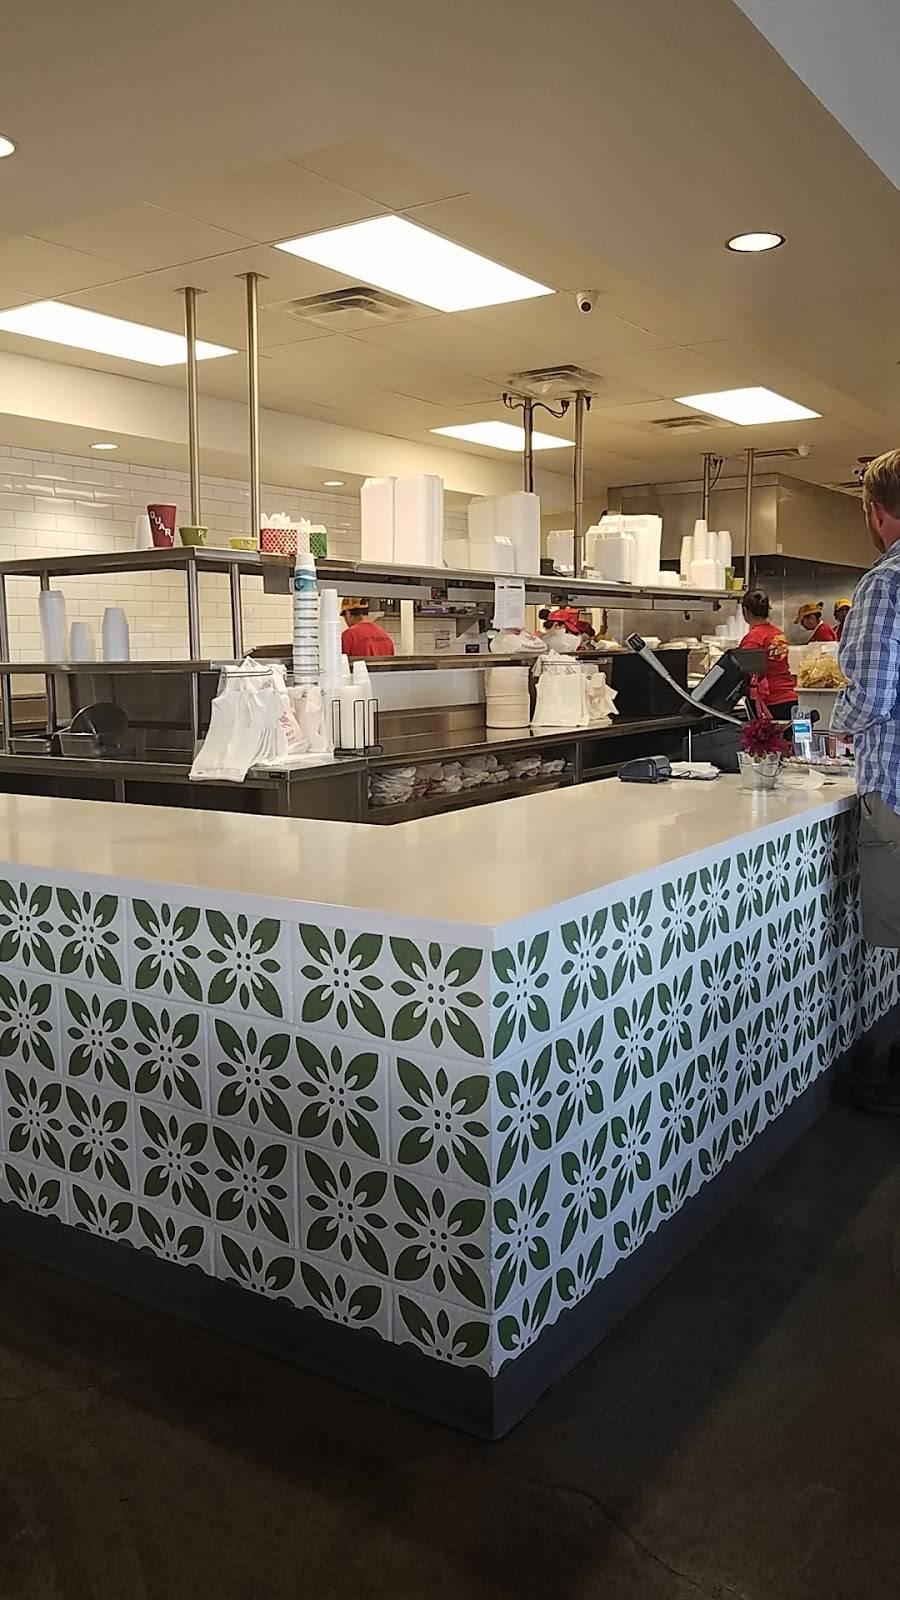 Carolinas Mexican Food - Mesa - restaurant  | Photo 4 of 10 | Address: 1450 S Country Club Dr, Mesa, AZ 85210, USA | Phone: (480) 912-3420